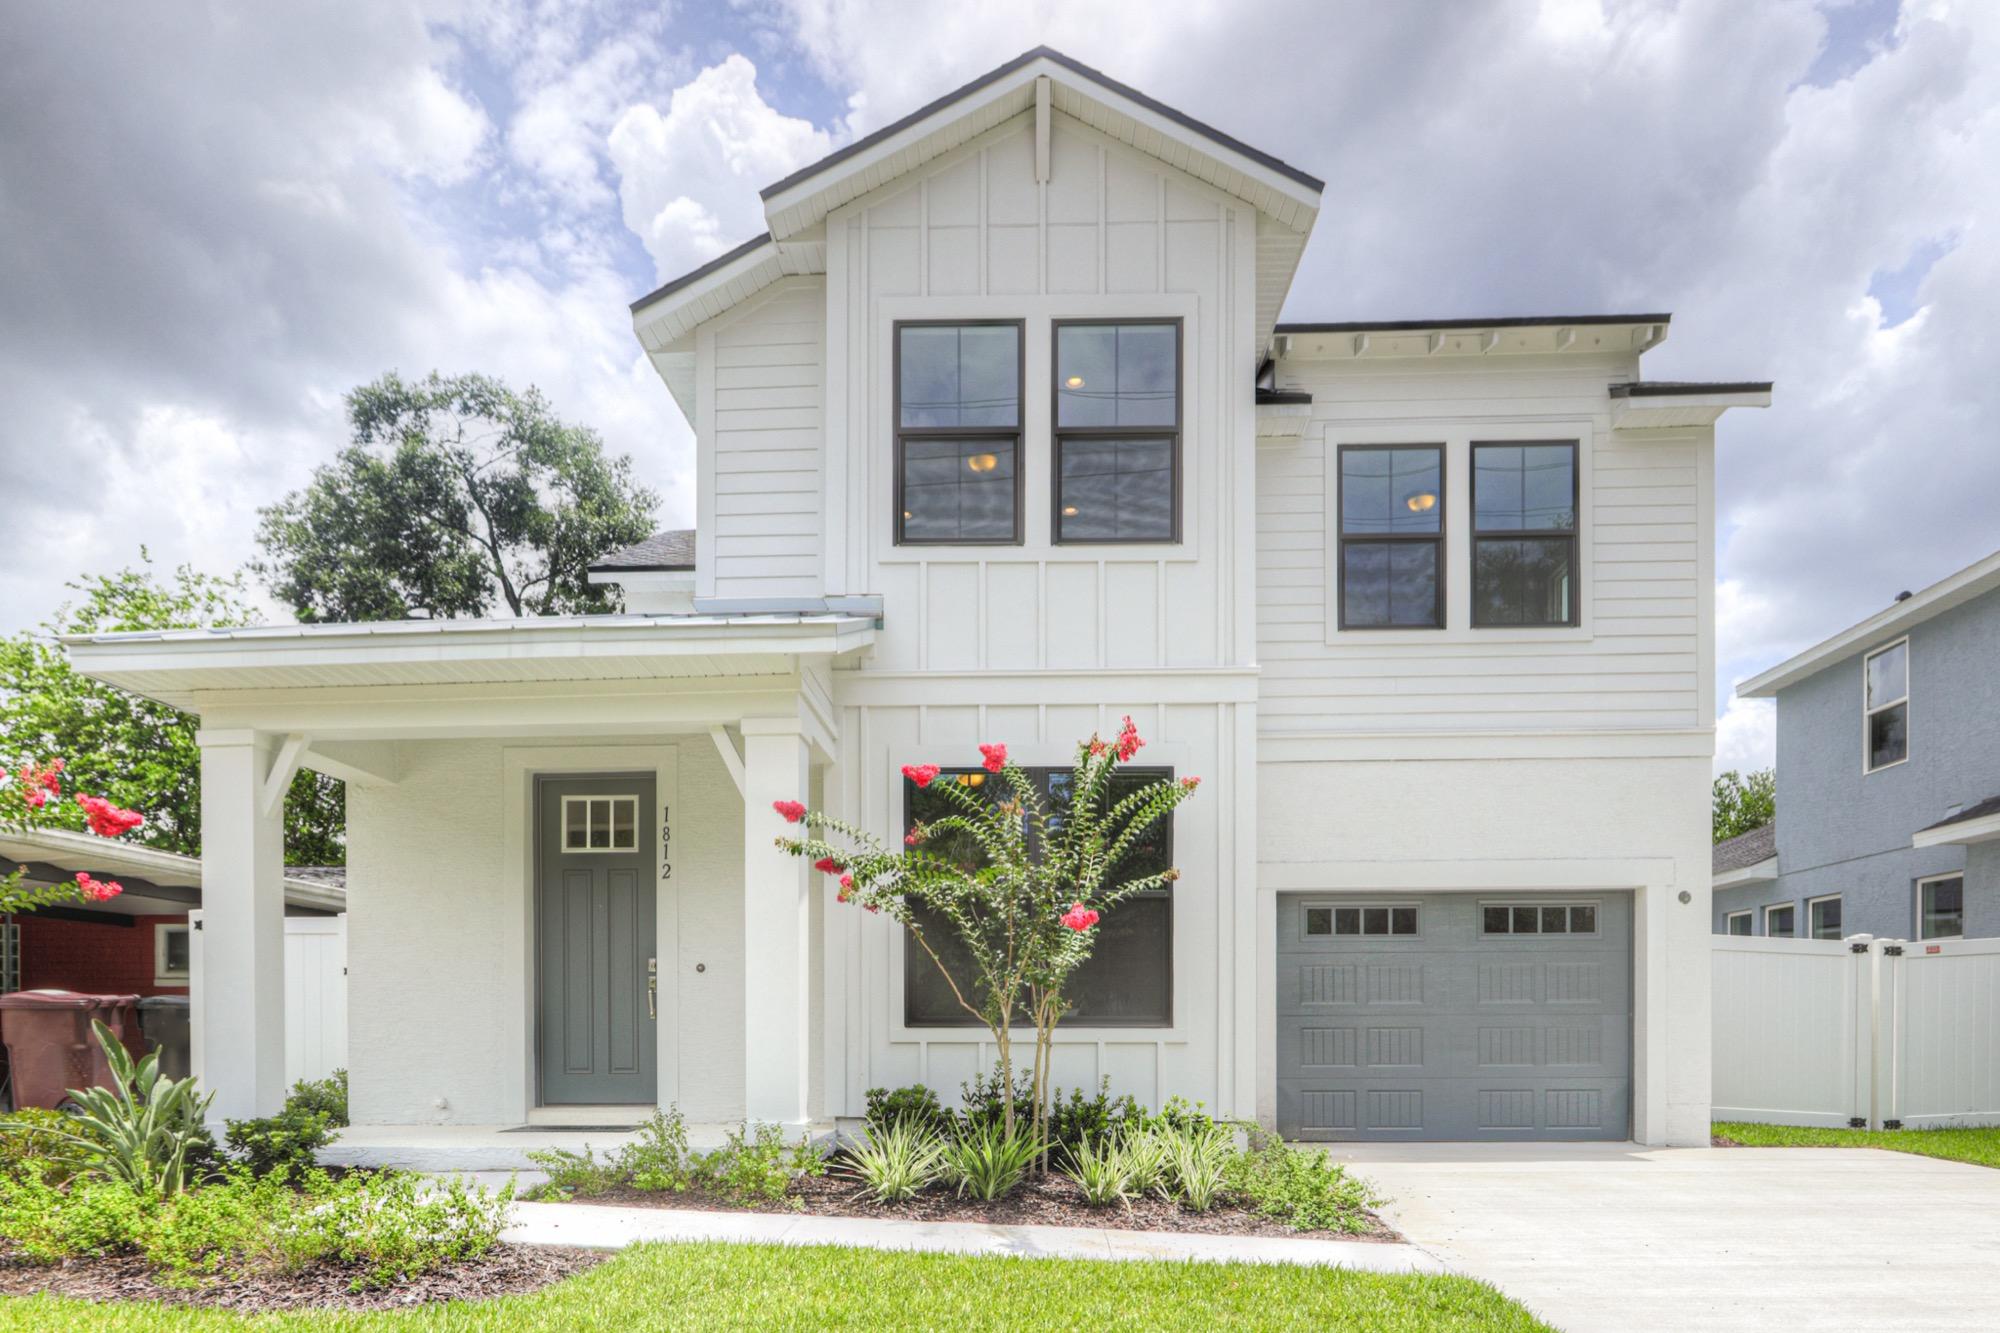 1812 Oregon St, Orlando, FL 32803